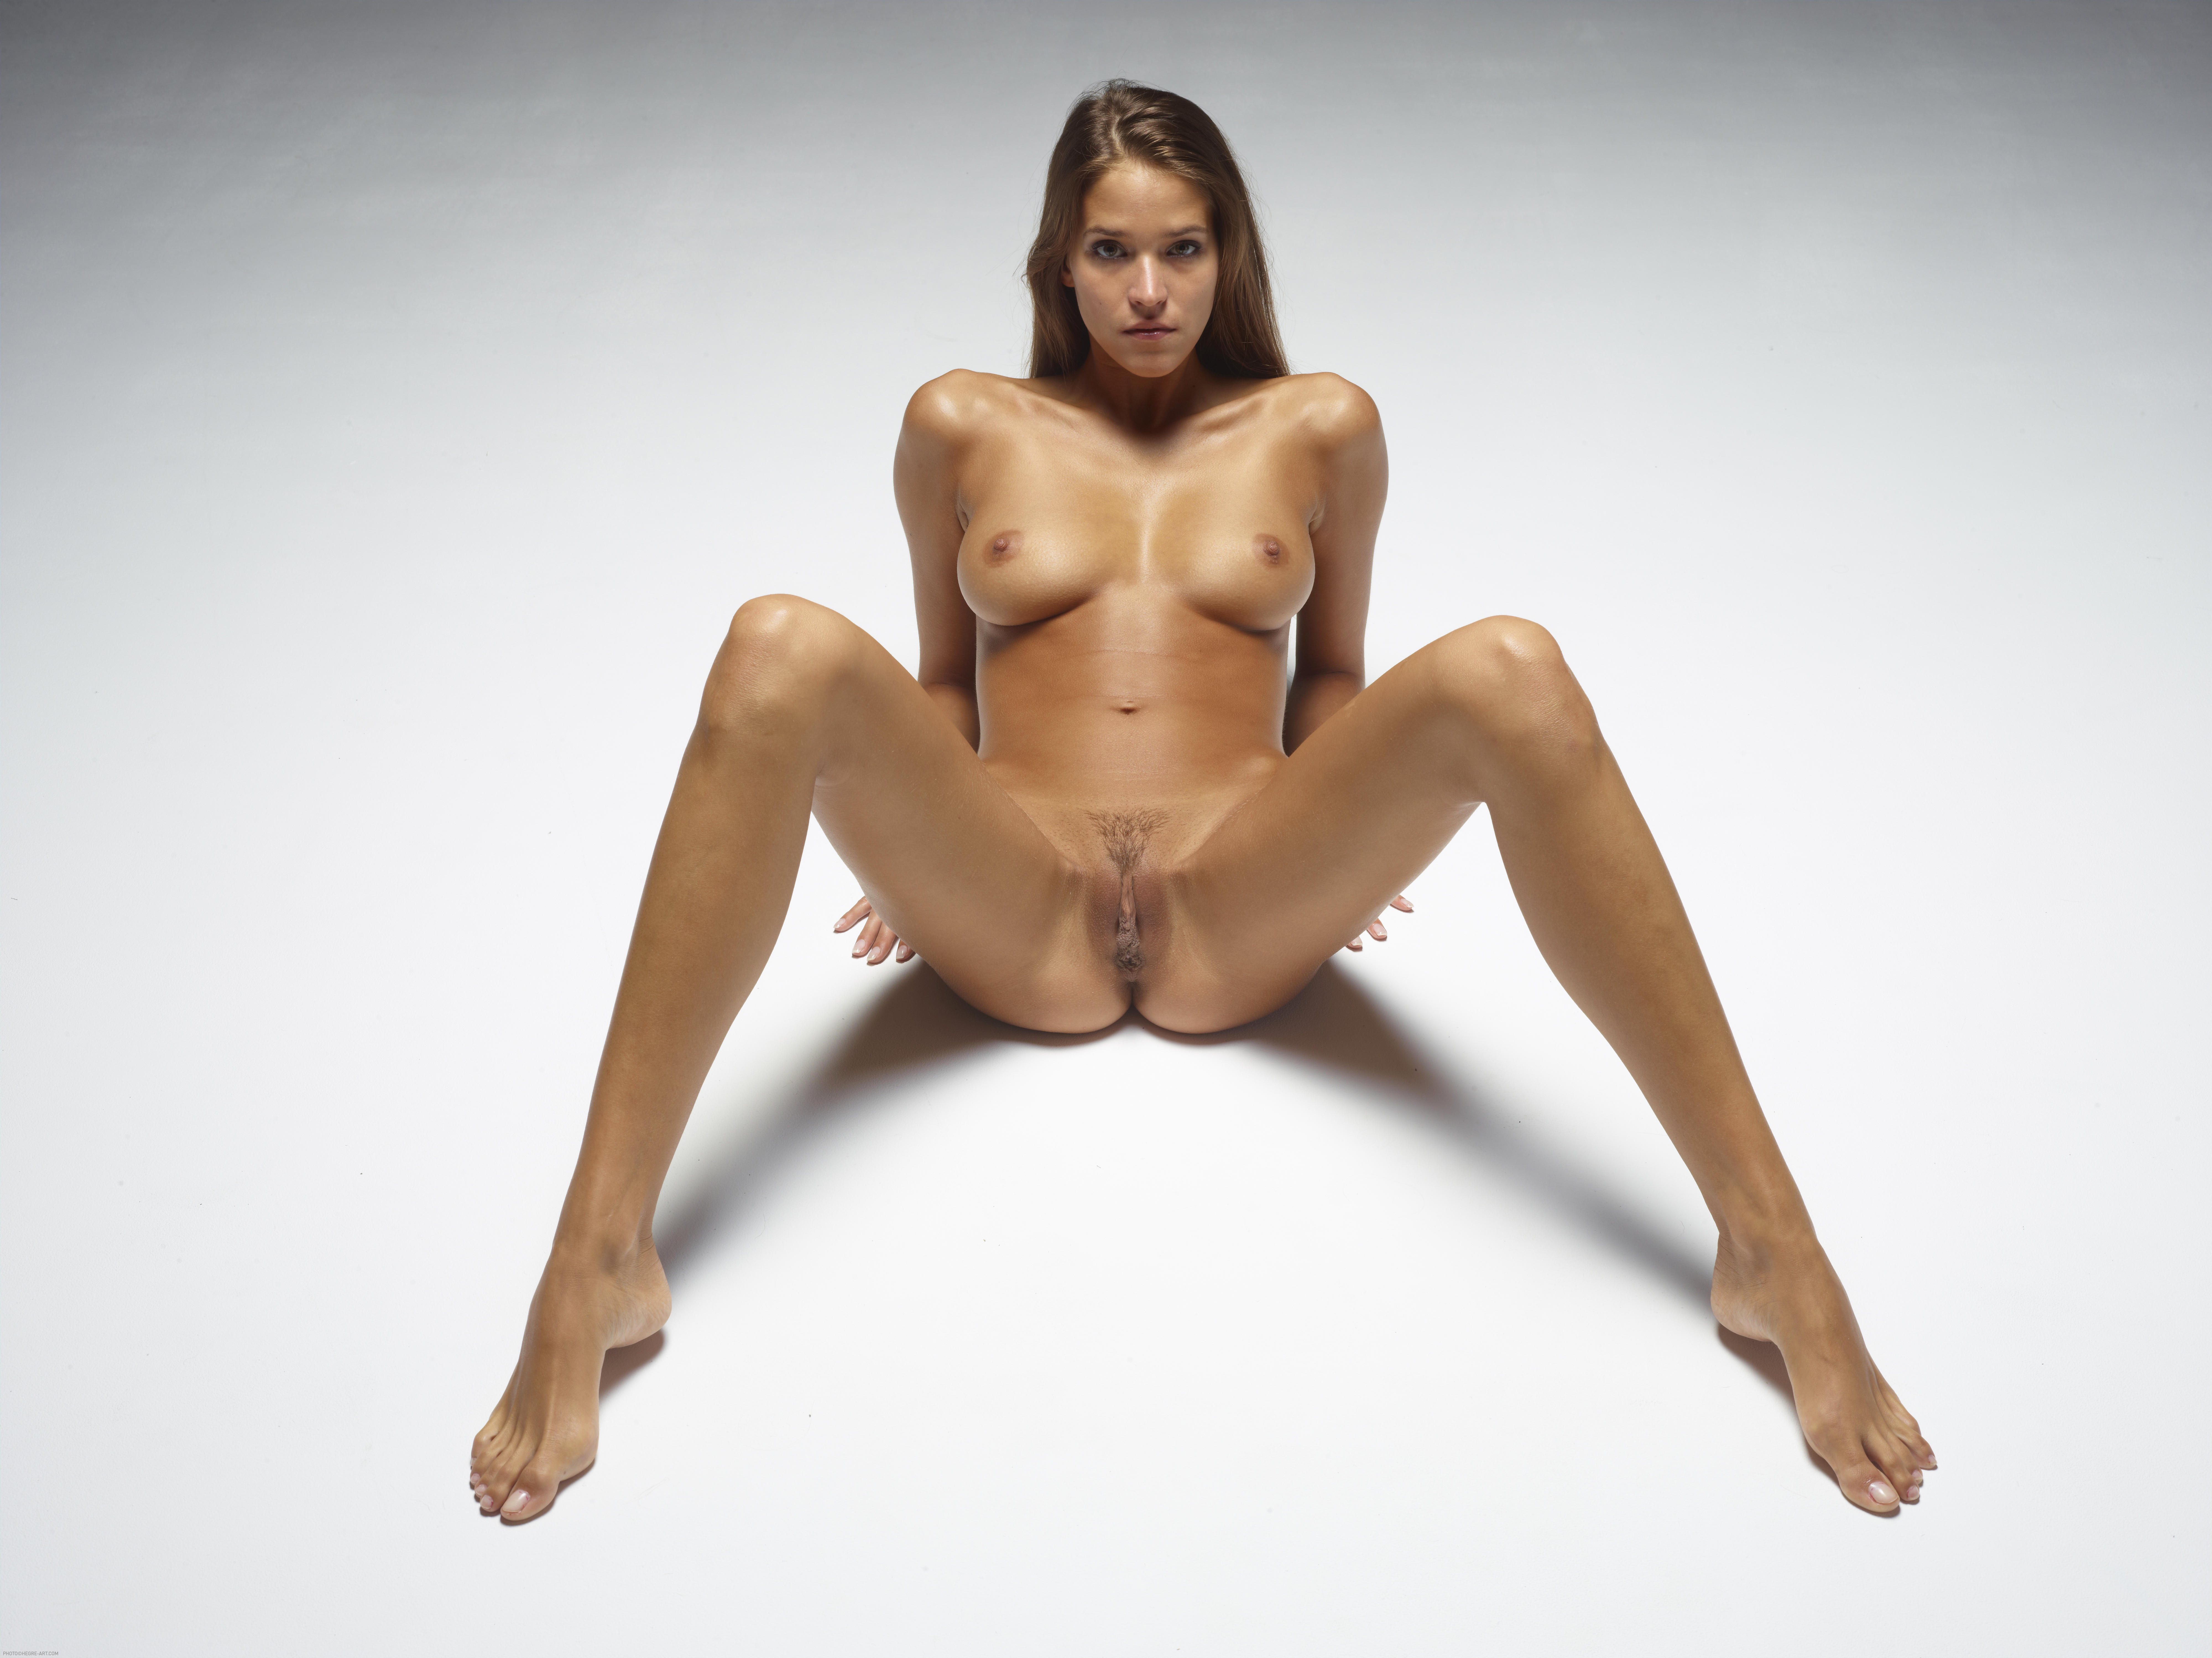 Big booty girls porn